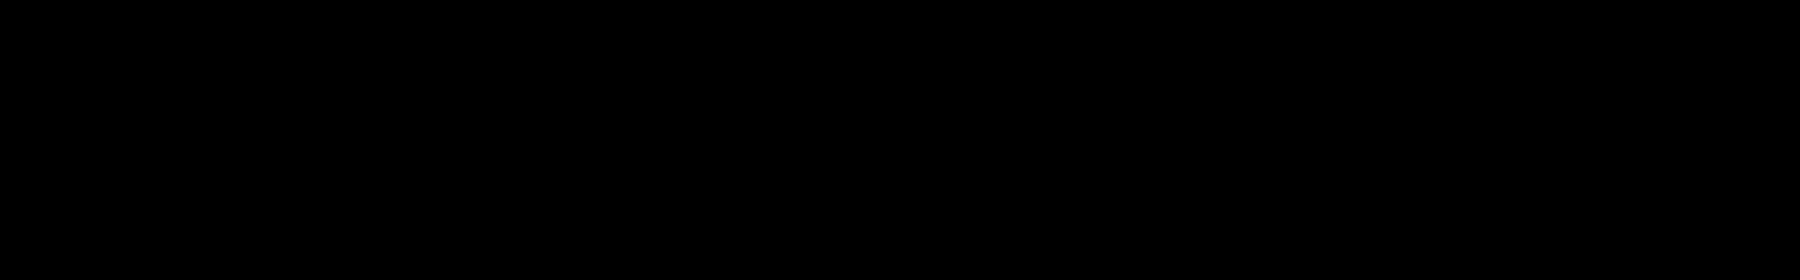 Chime Dubstep audio waveform